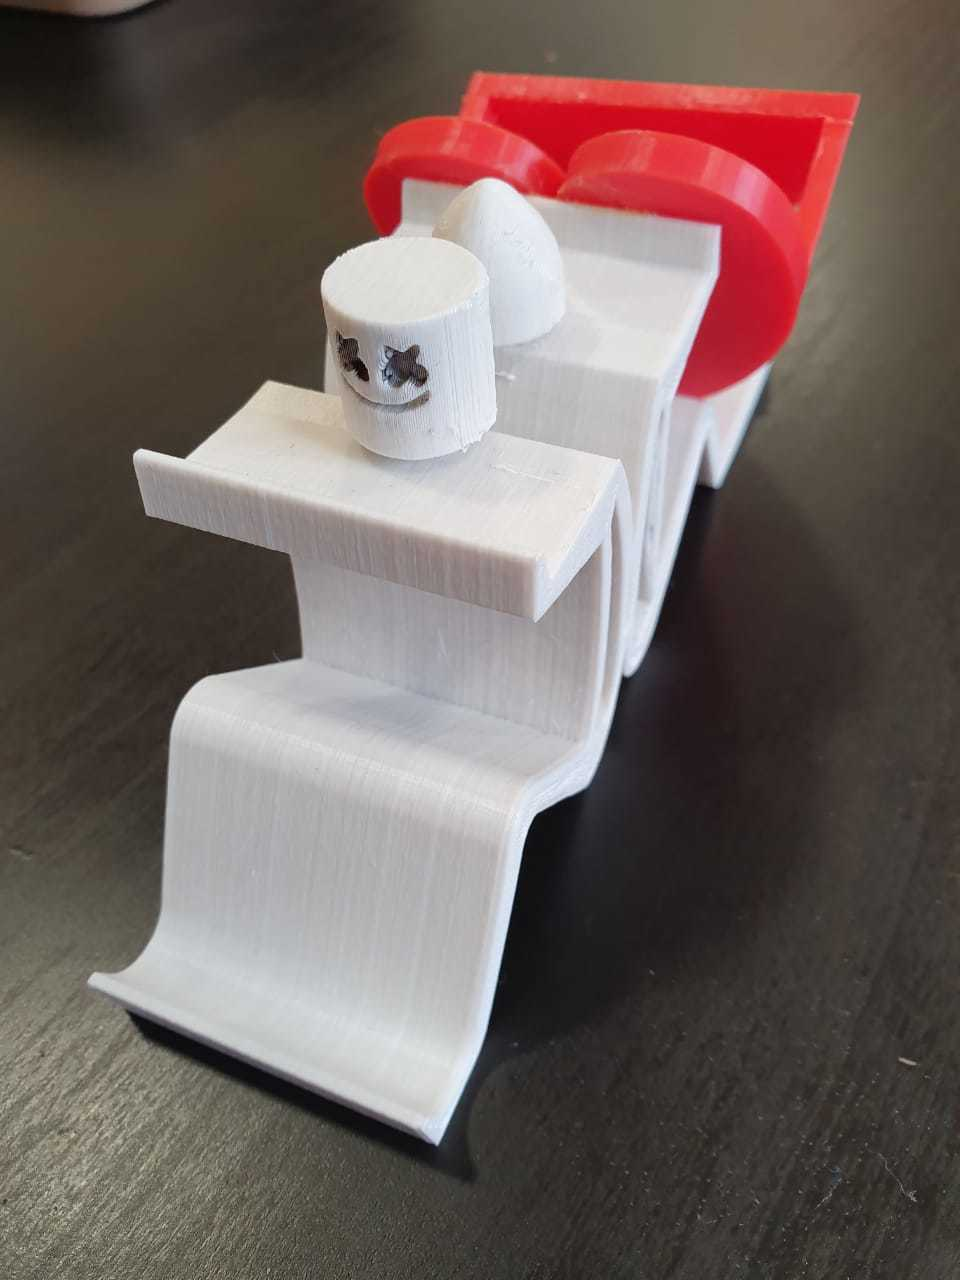 Stand_HeartCase.jpeg Download free STL file Mobile Phone Stand & Airpods Heart Box • 3D printer model, mennaelfrash55